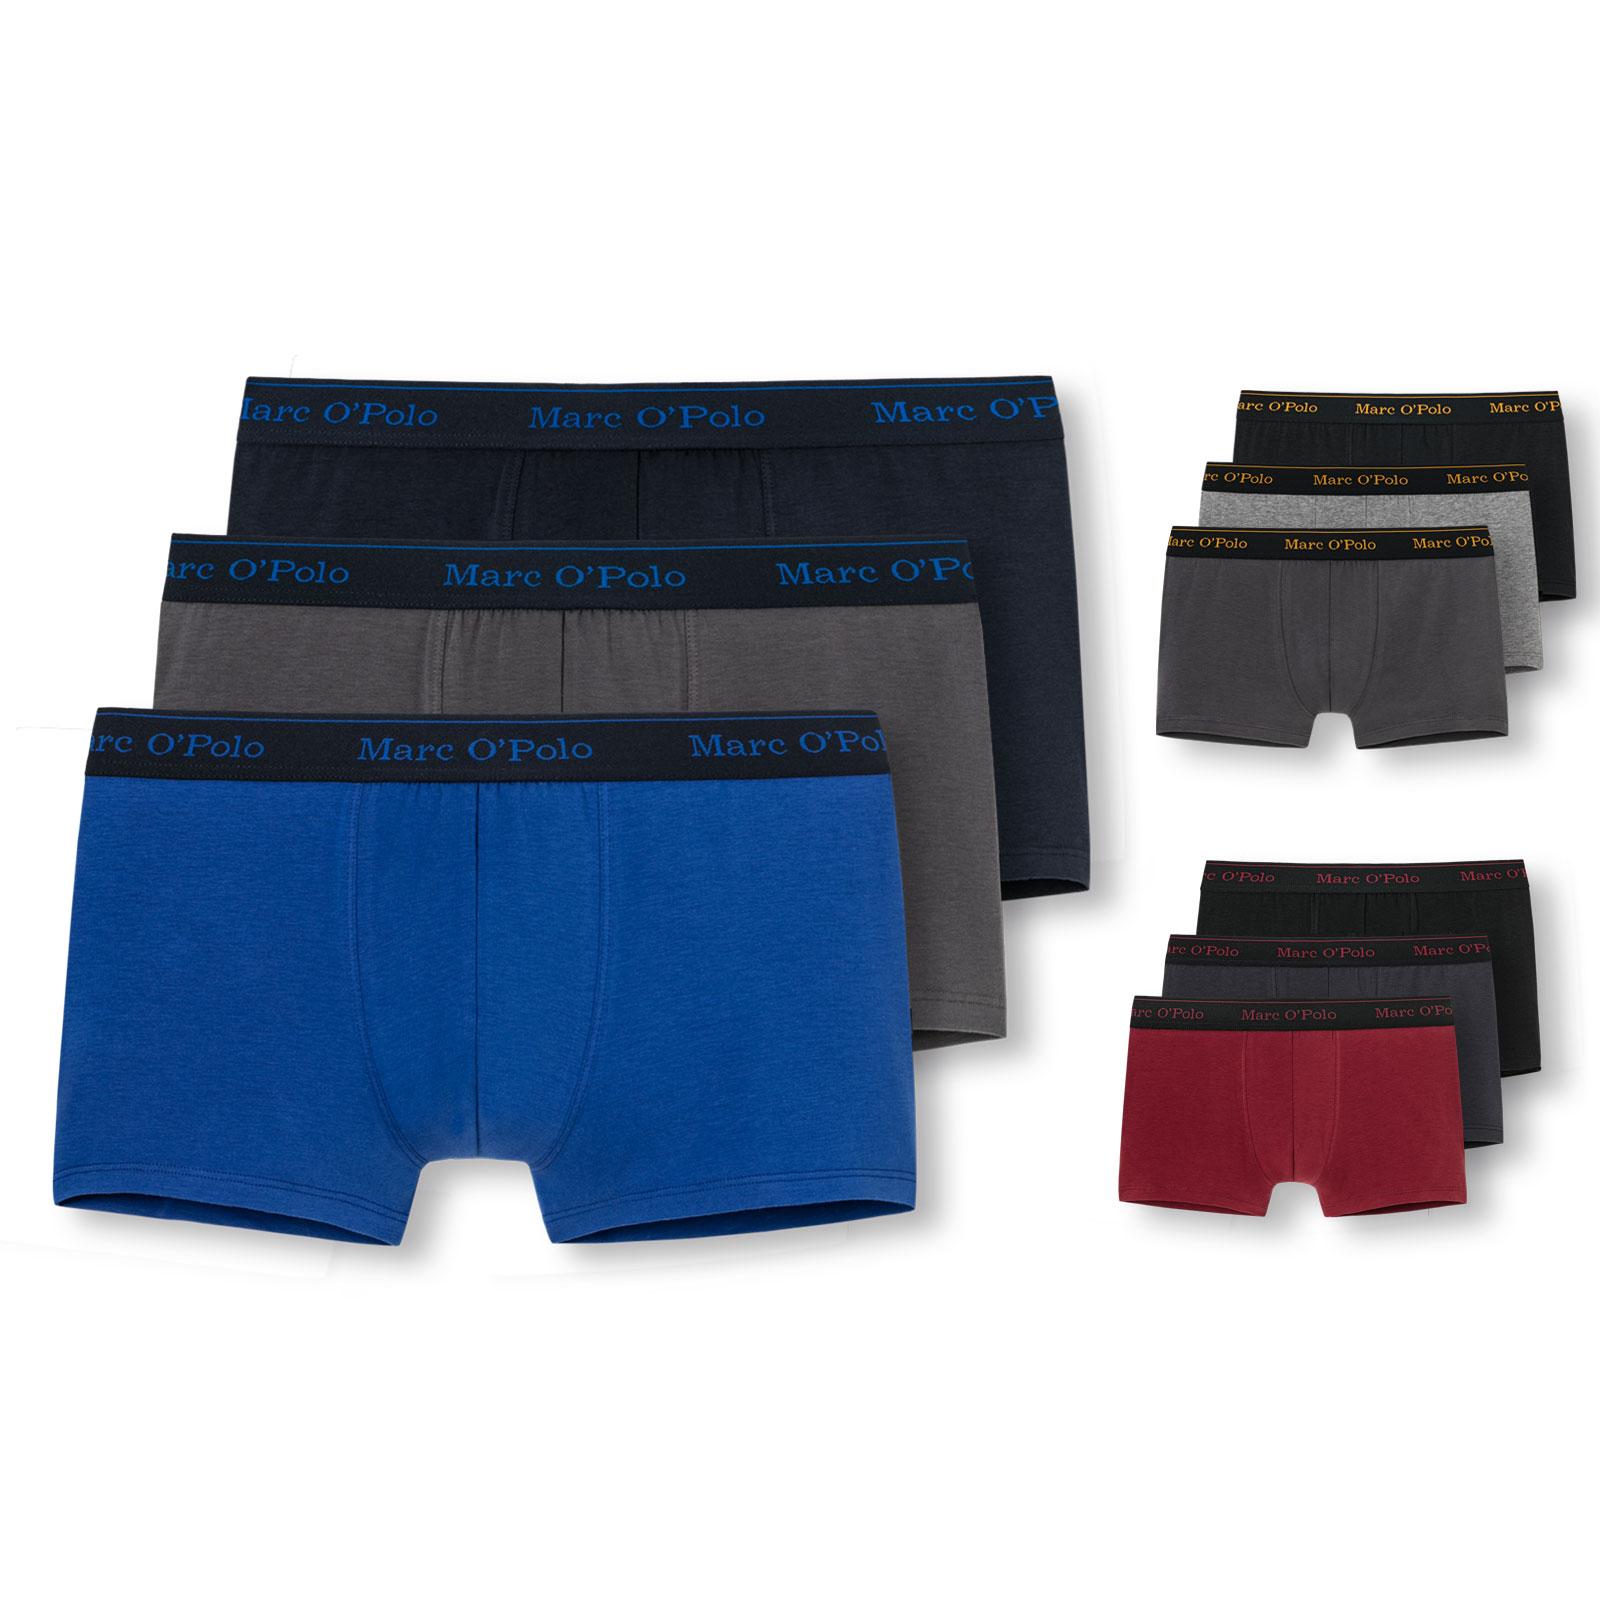 3er Pack Marc O/'Polo Herren Boxershorts Boxer Unterhosen Trunks Shorts Farbwahl